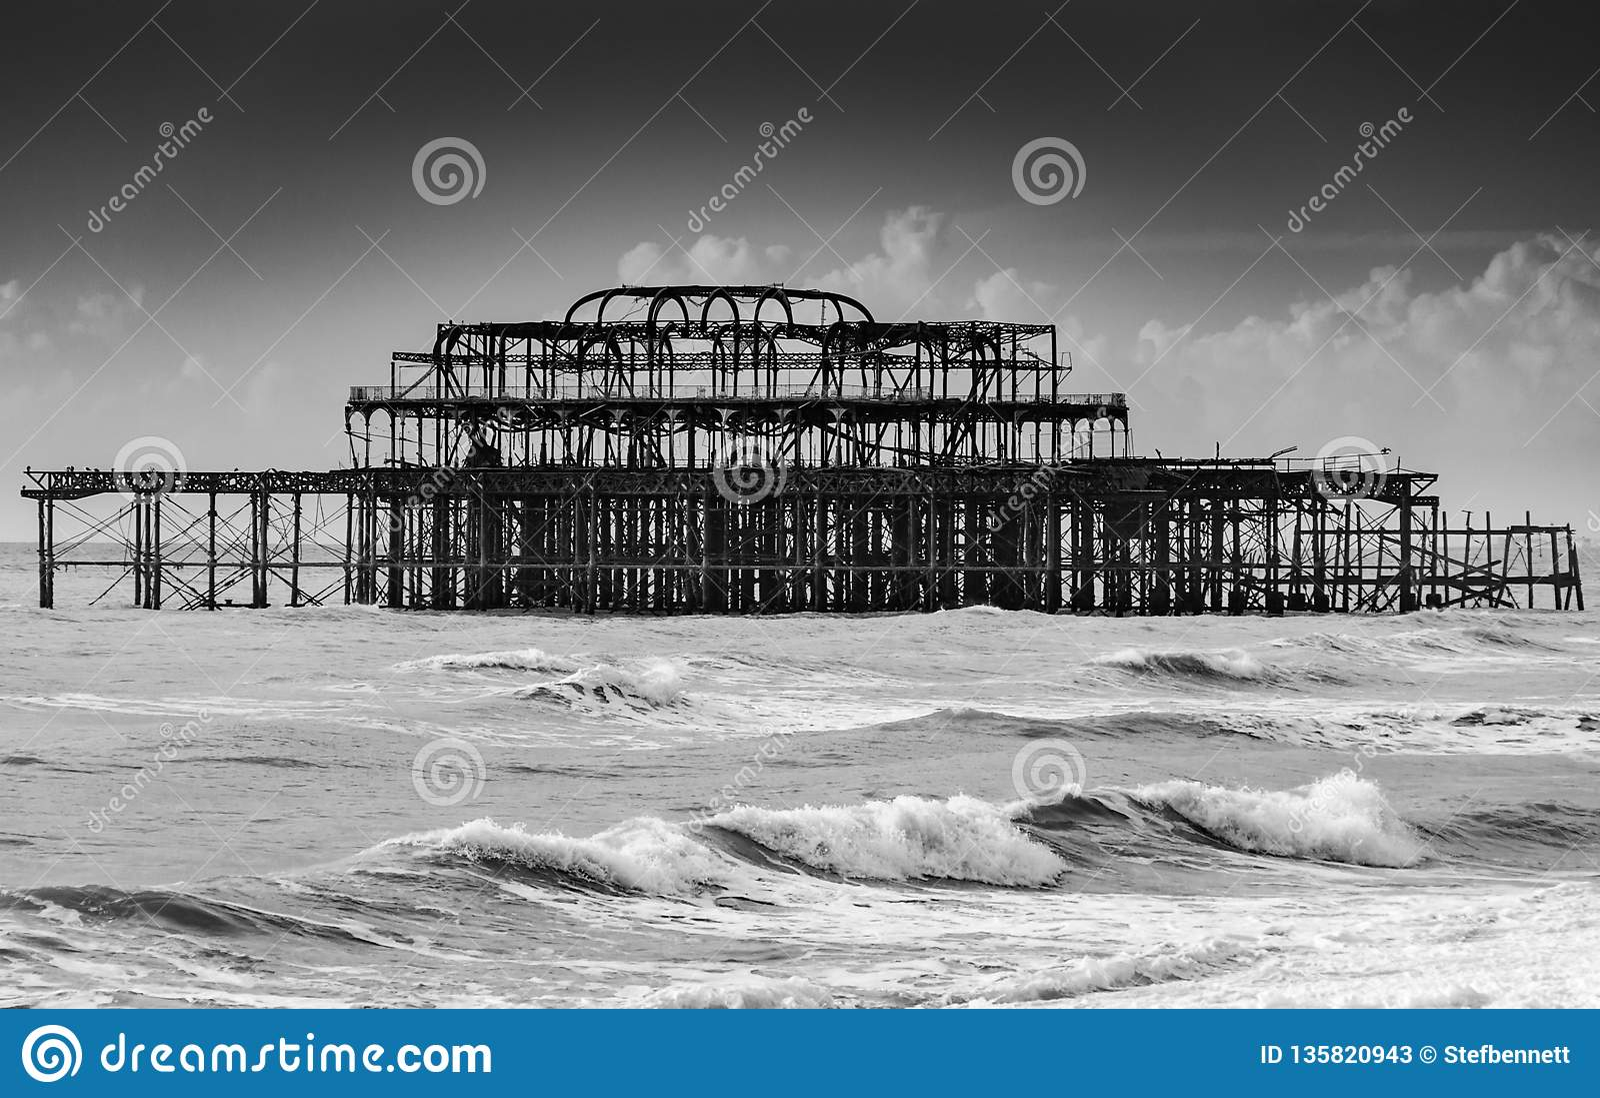 Ruine de Brighton West Pier un jour orageux